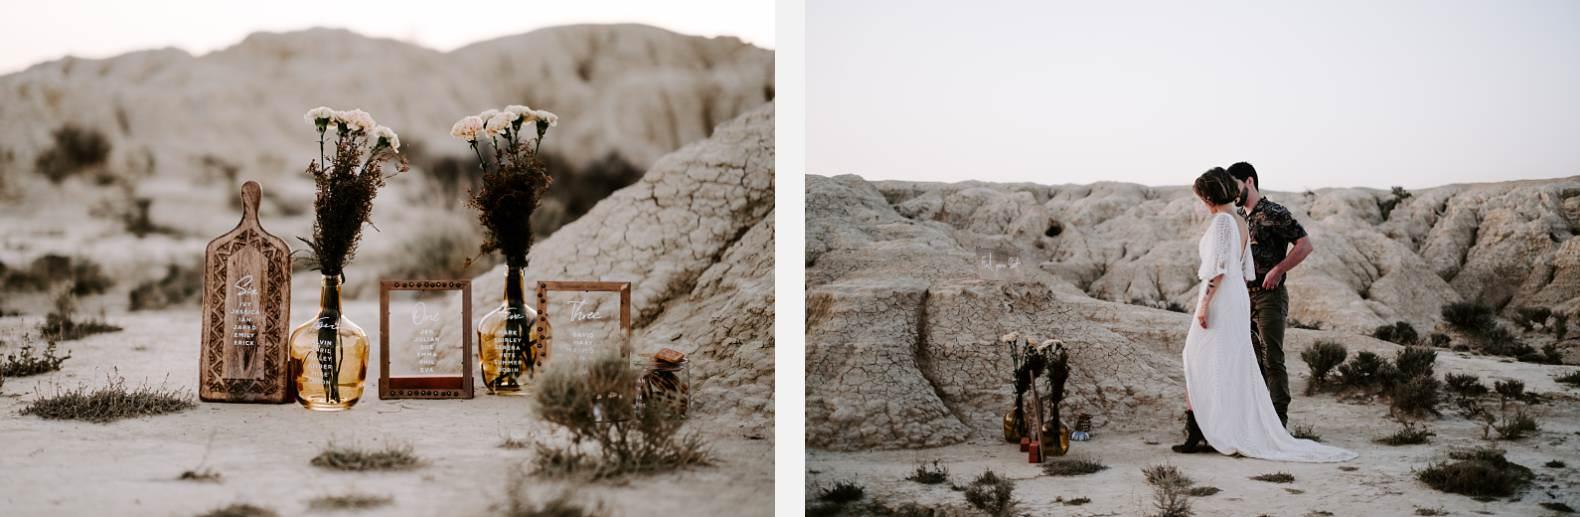 mariage espagne bardenas festival you and me elopement photographe bel esprit desert 0049